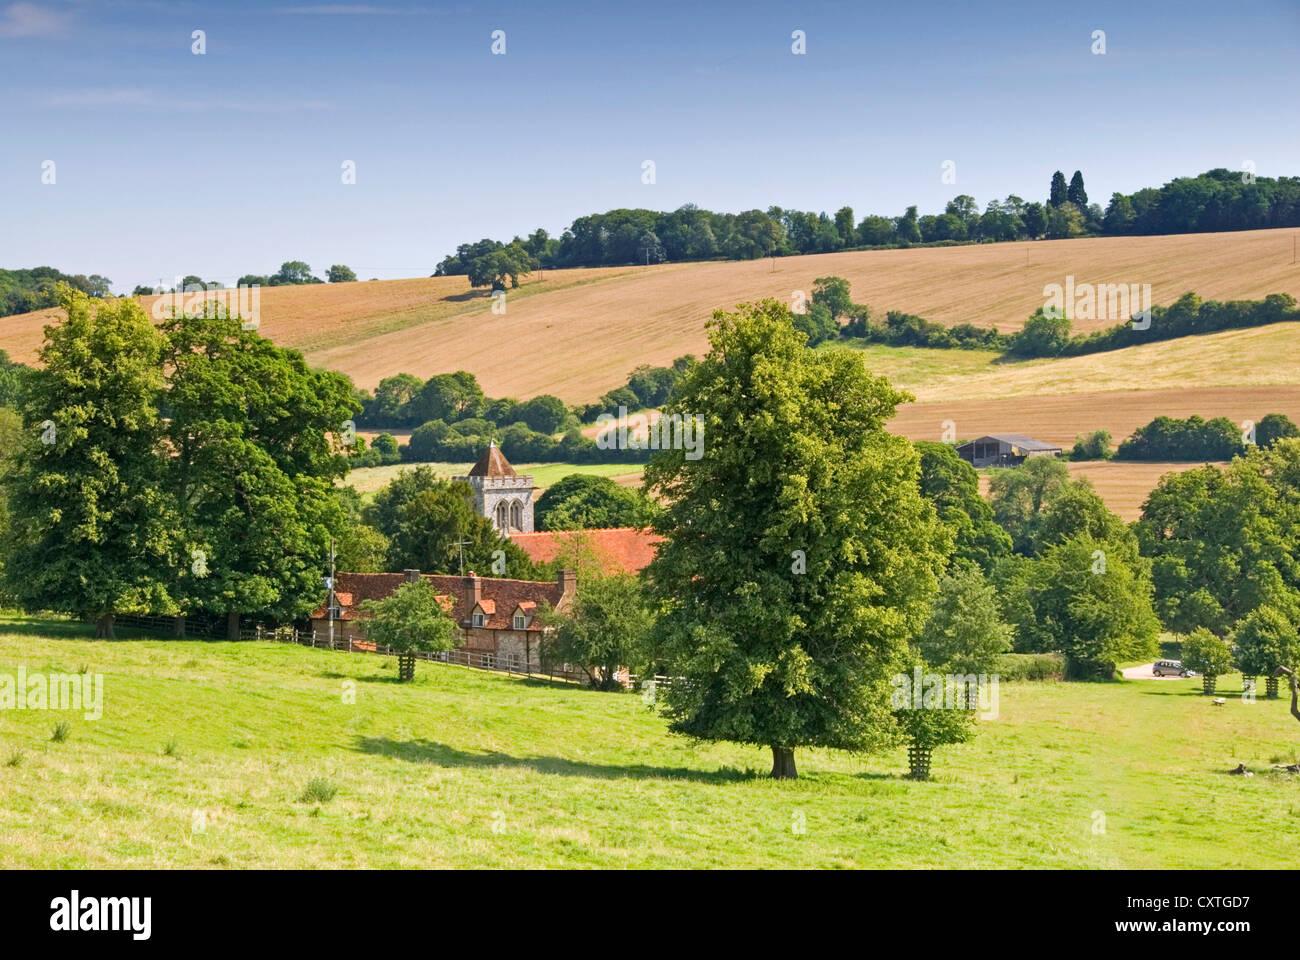 Bucks - Chiltern Hills - Hughenden valley - view to St Michael's church - bright summer sunlight - blue sky - Stock Image